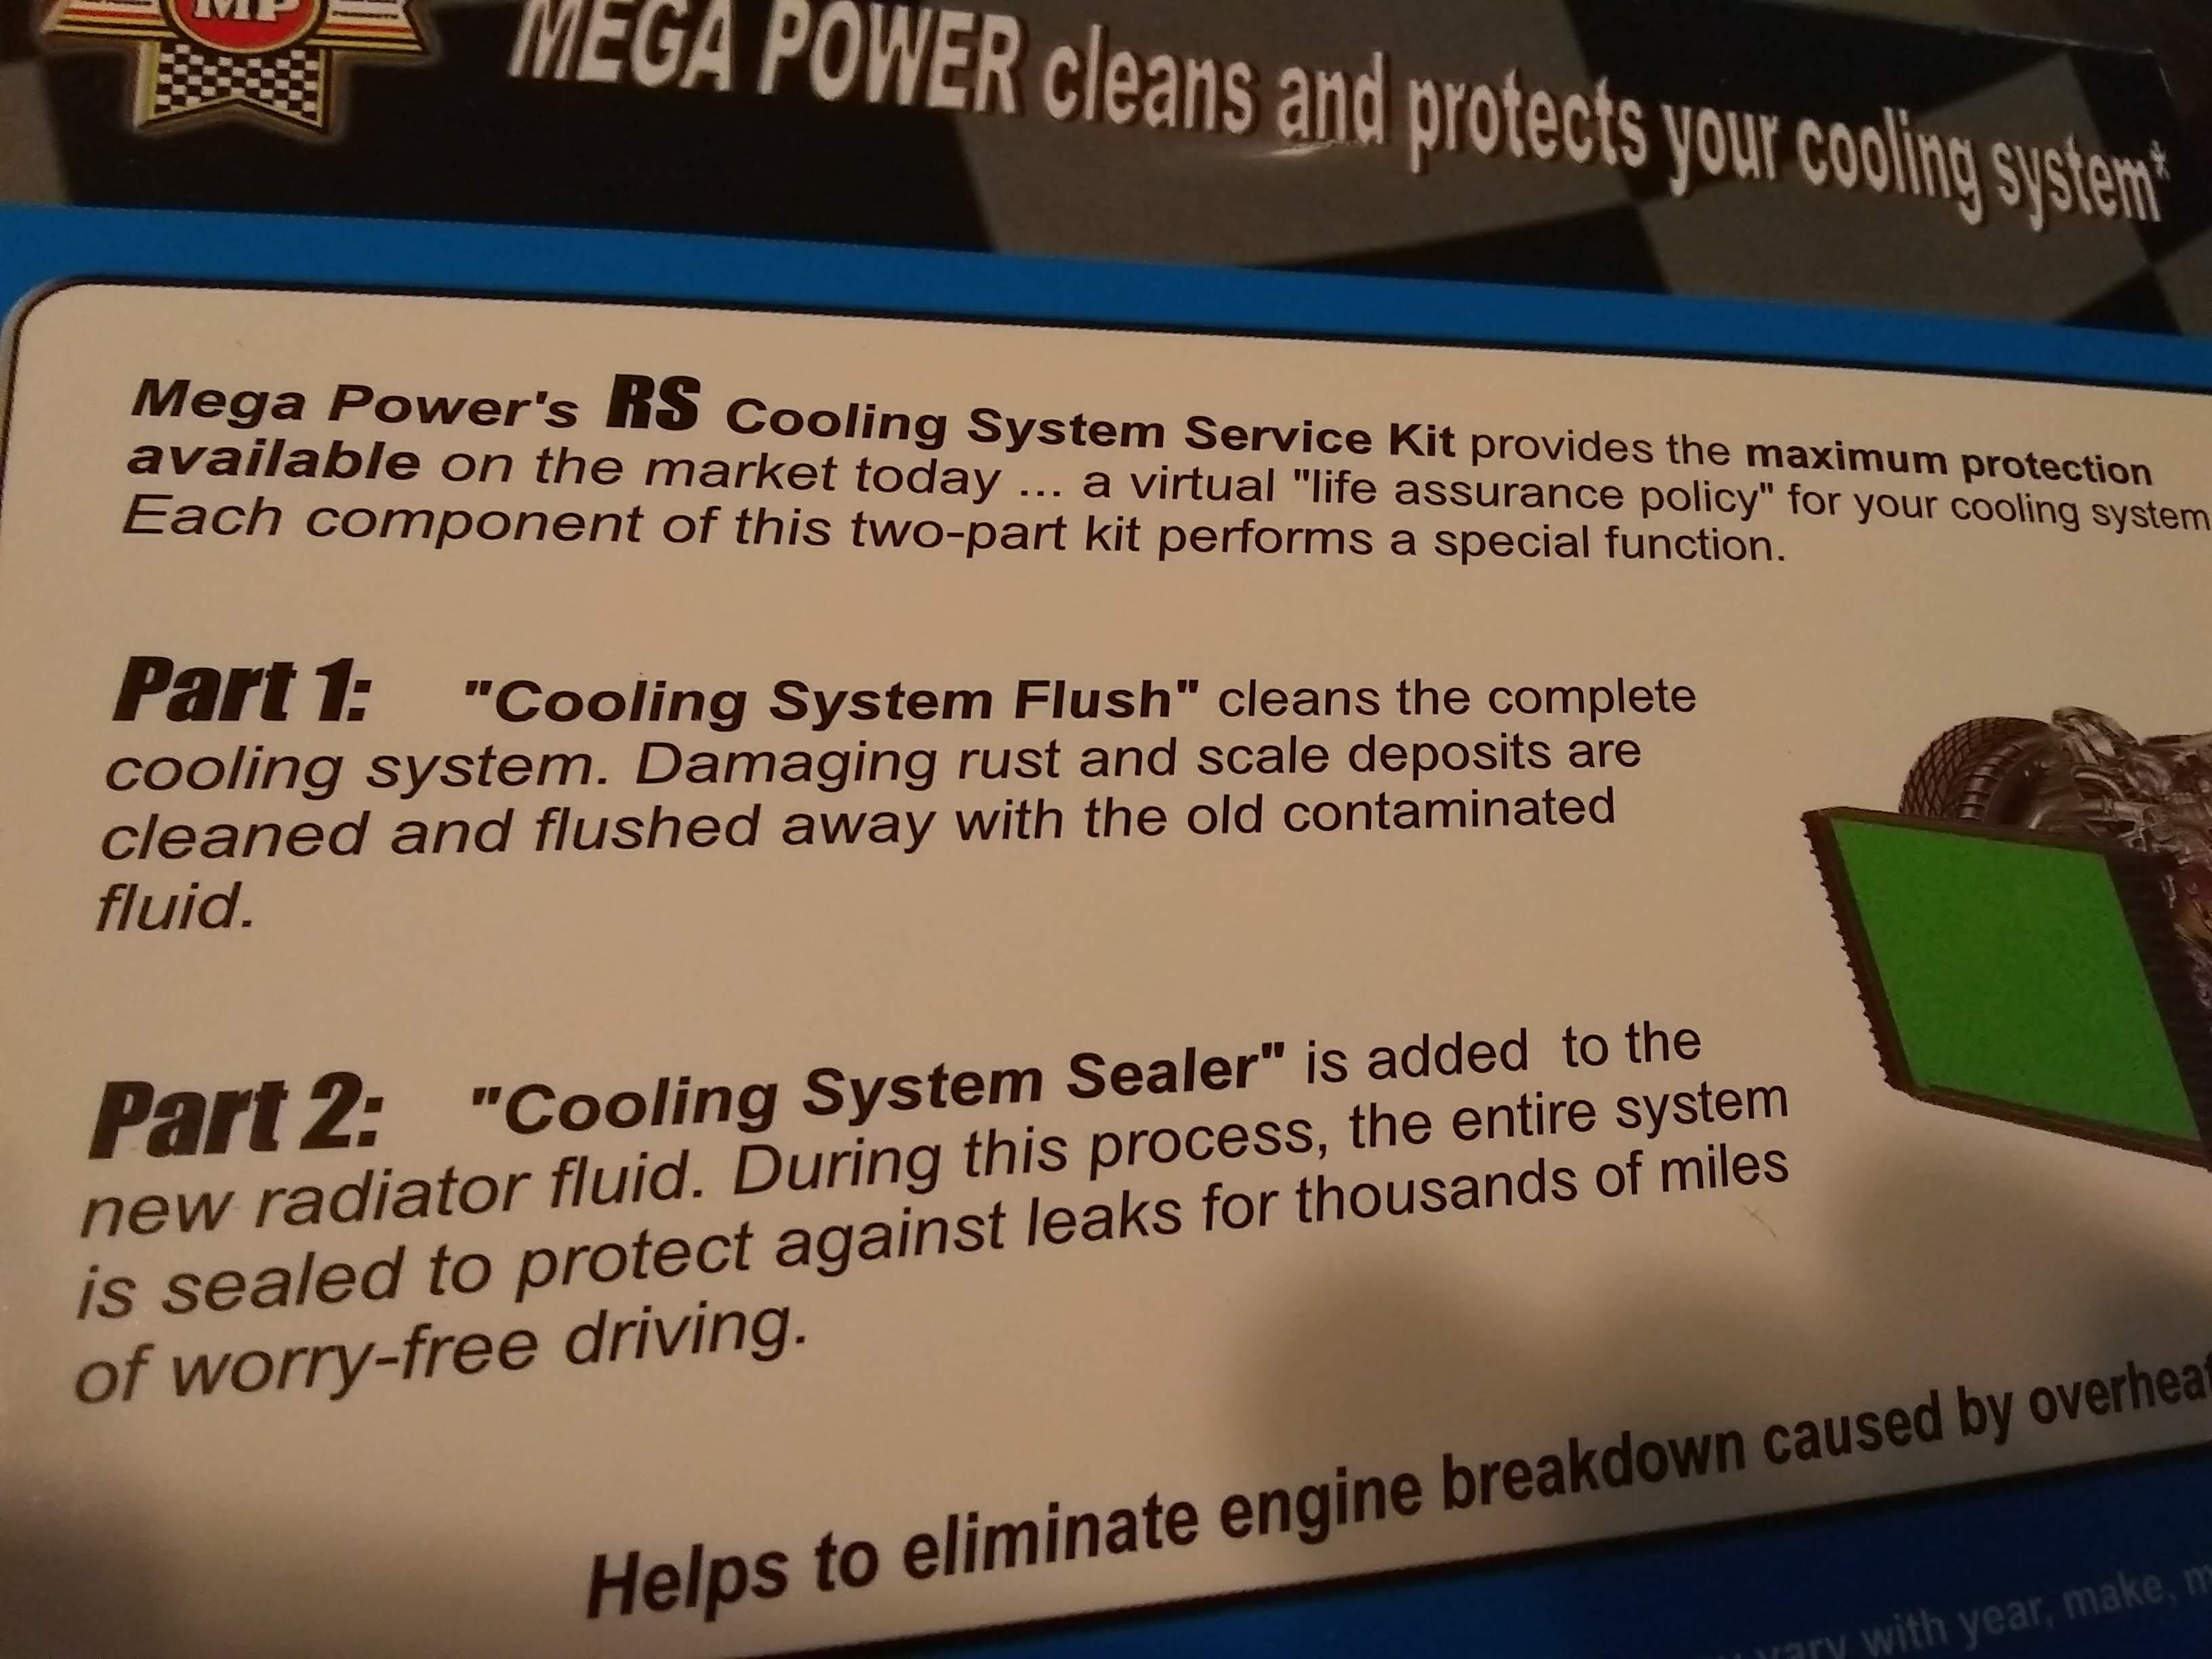 Radiator problem solver: Stops leaks  Reduces Overheating